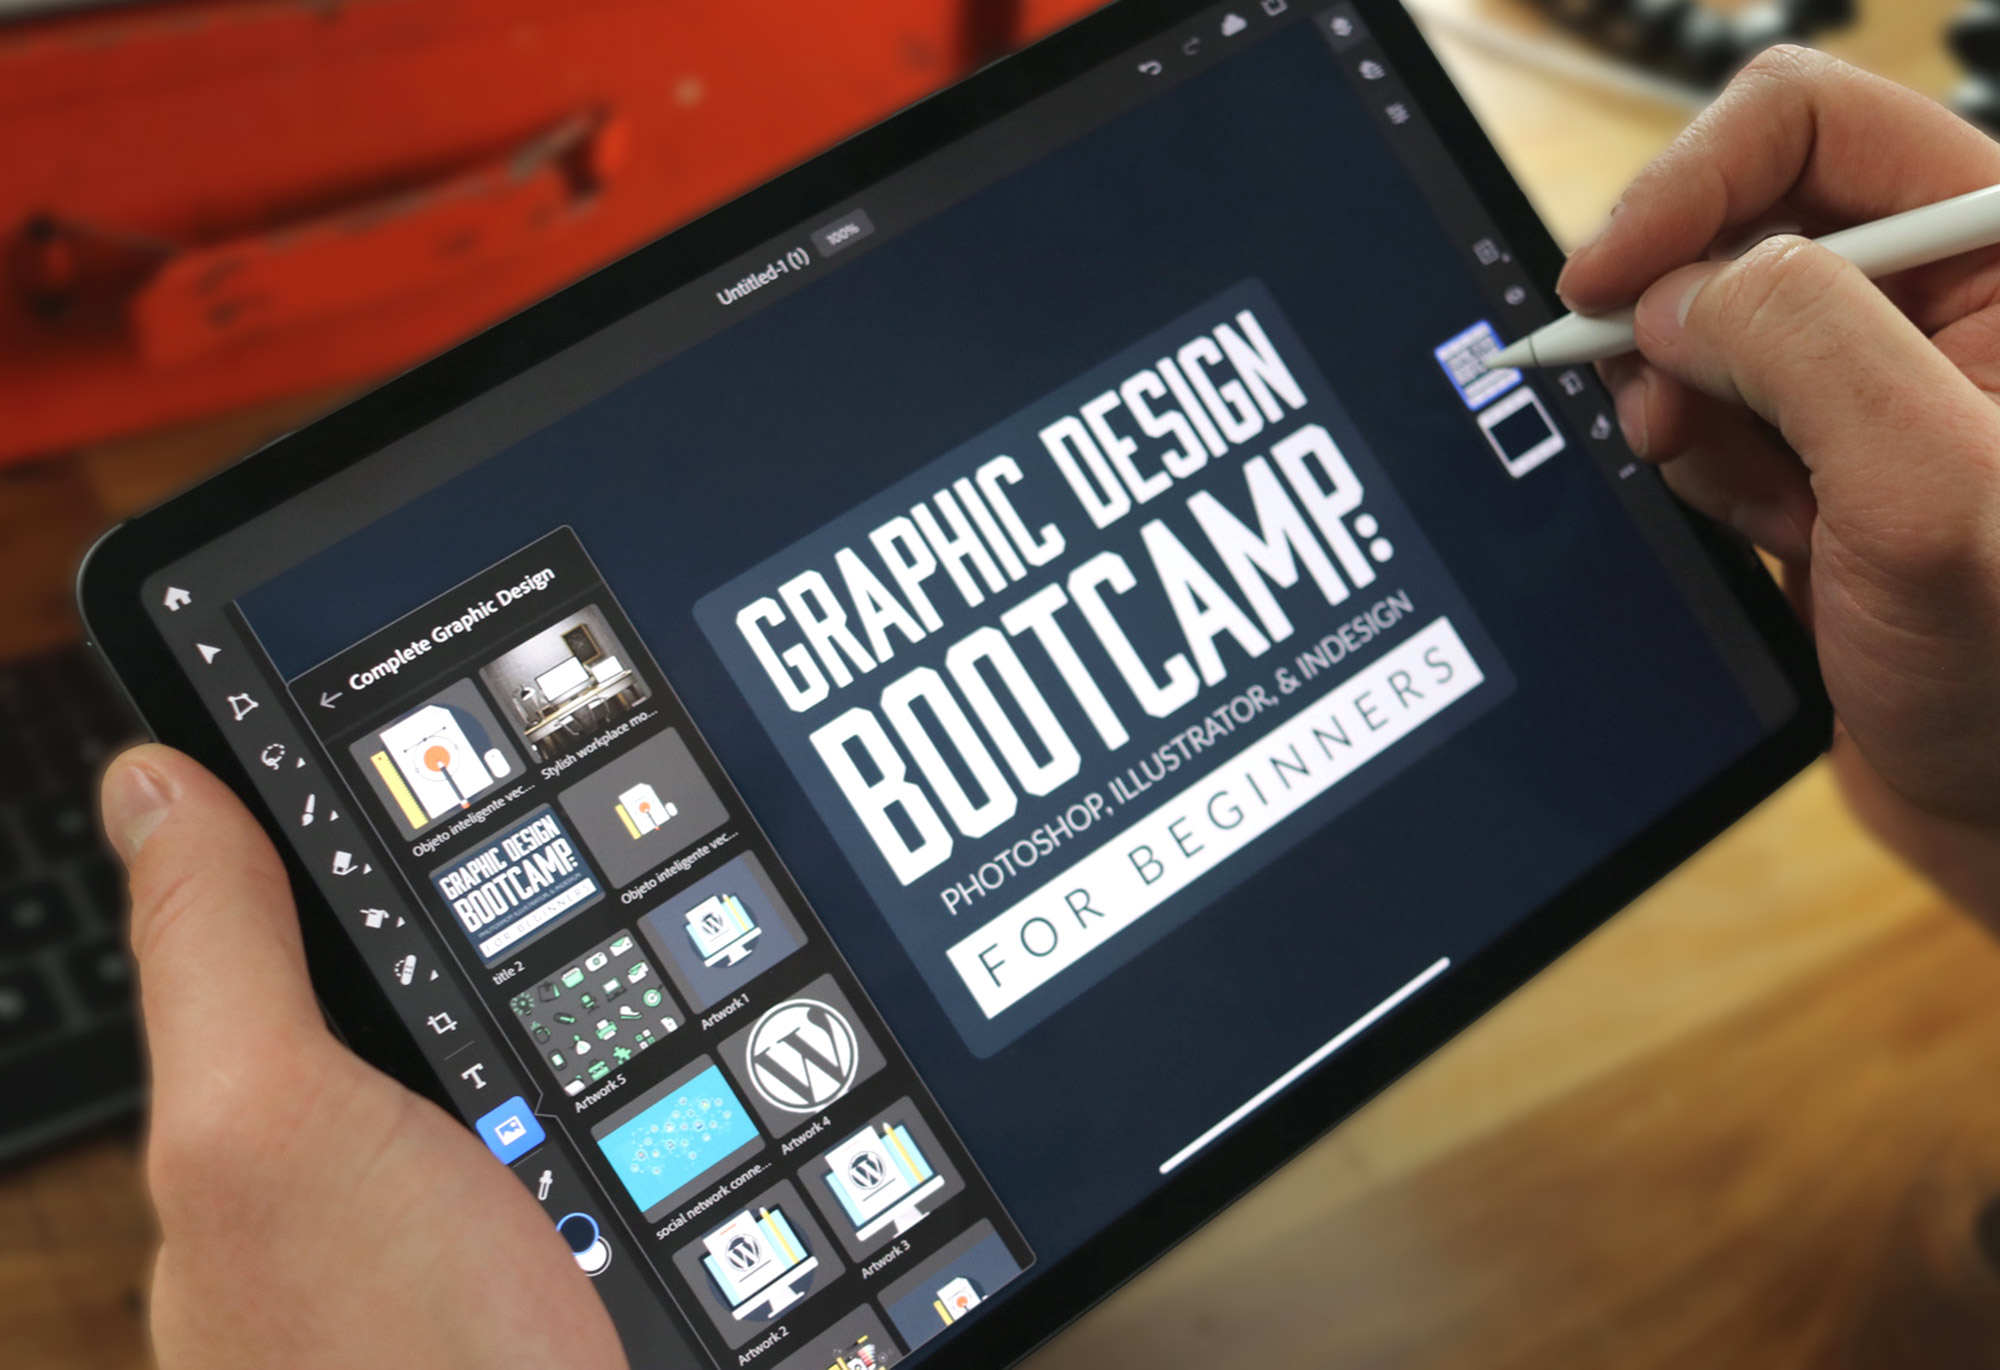 Adobe Photoshop 2020 for iPad